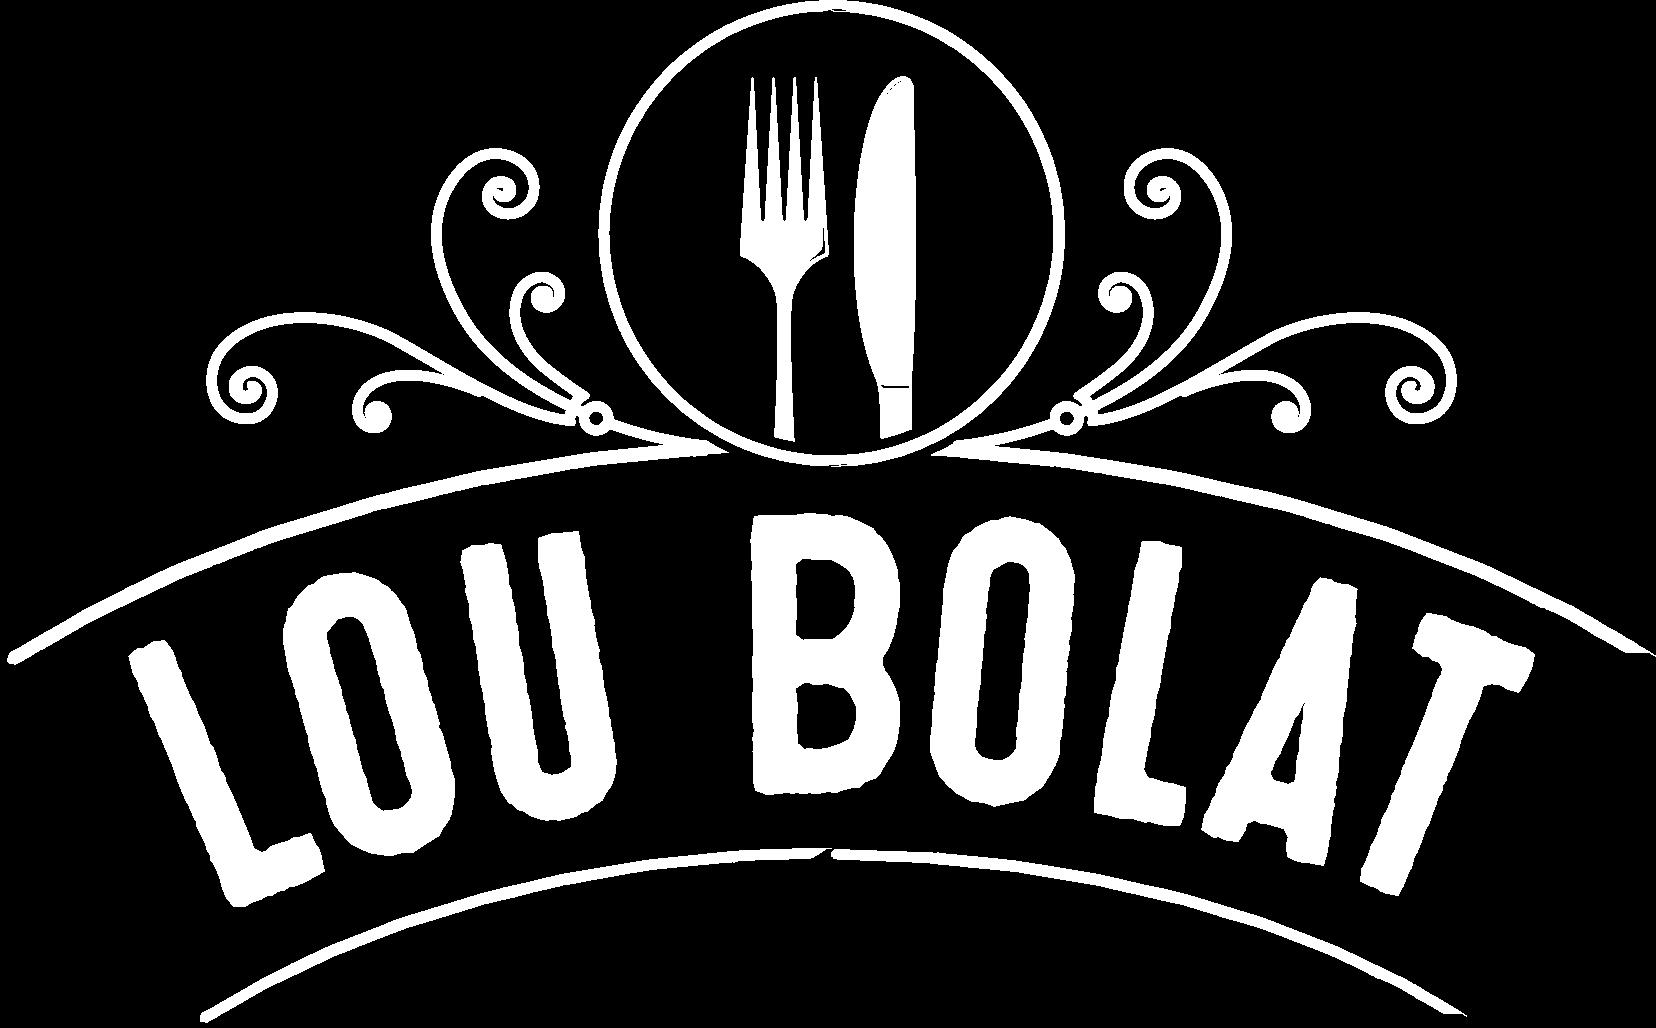 Lou Bolat